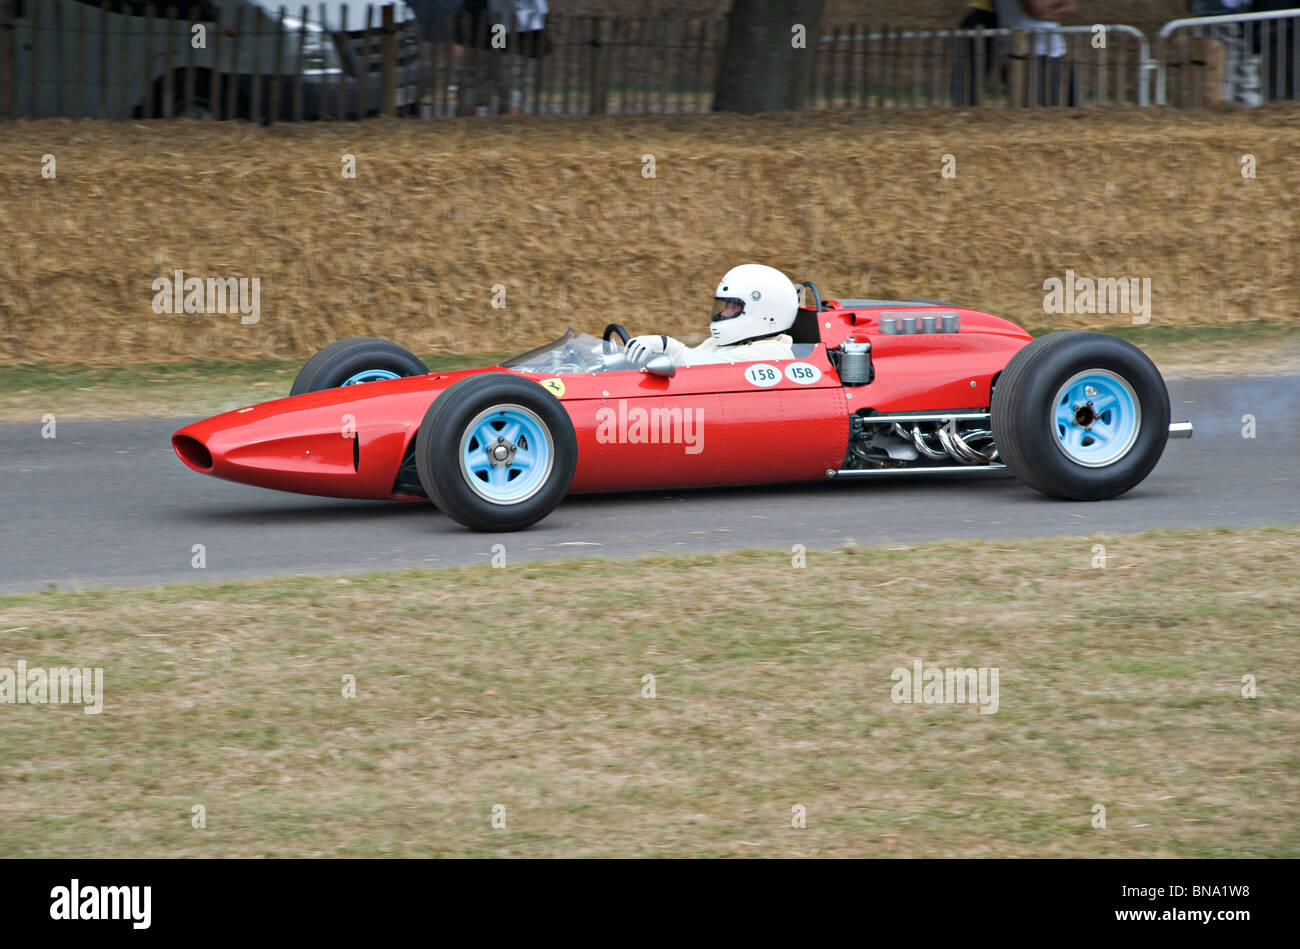 Ferrari 158 Historic Formula One Racing Car at Goodwood Festival of Speed West Sussex England United Kingdom UK - Stock Image